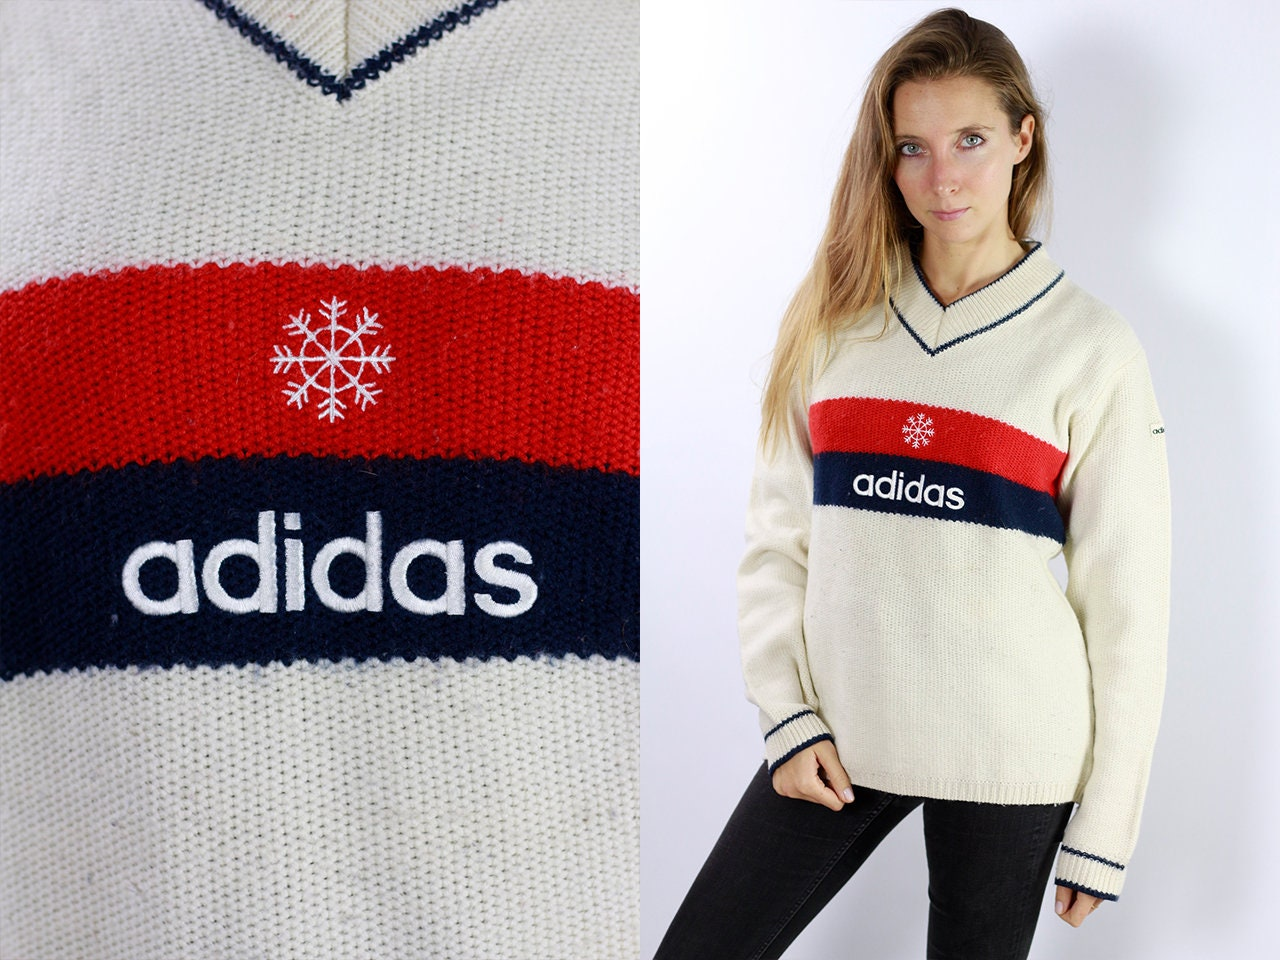 ef8cd59ae3b Adidas Sweatshirt Adidas Sweater Adidas Jumper 90s Adidas Jacket ...